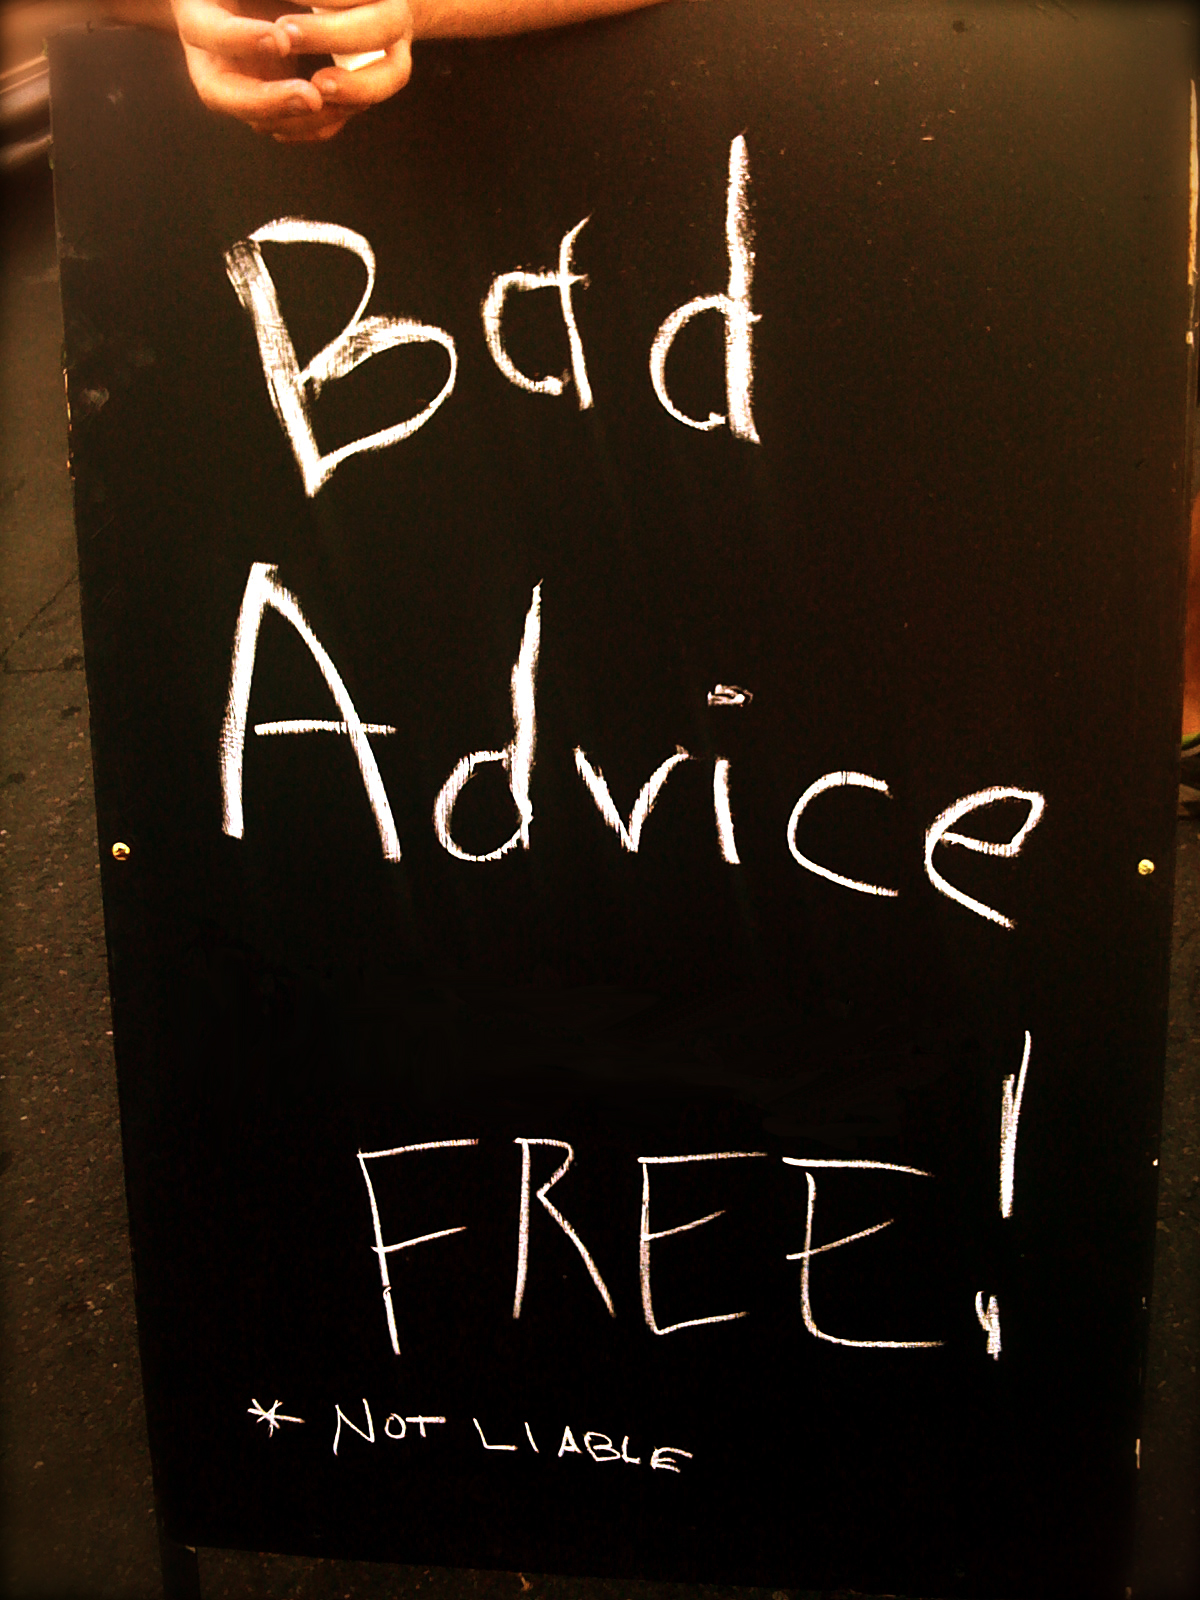 Bad entrepreneur advice